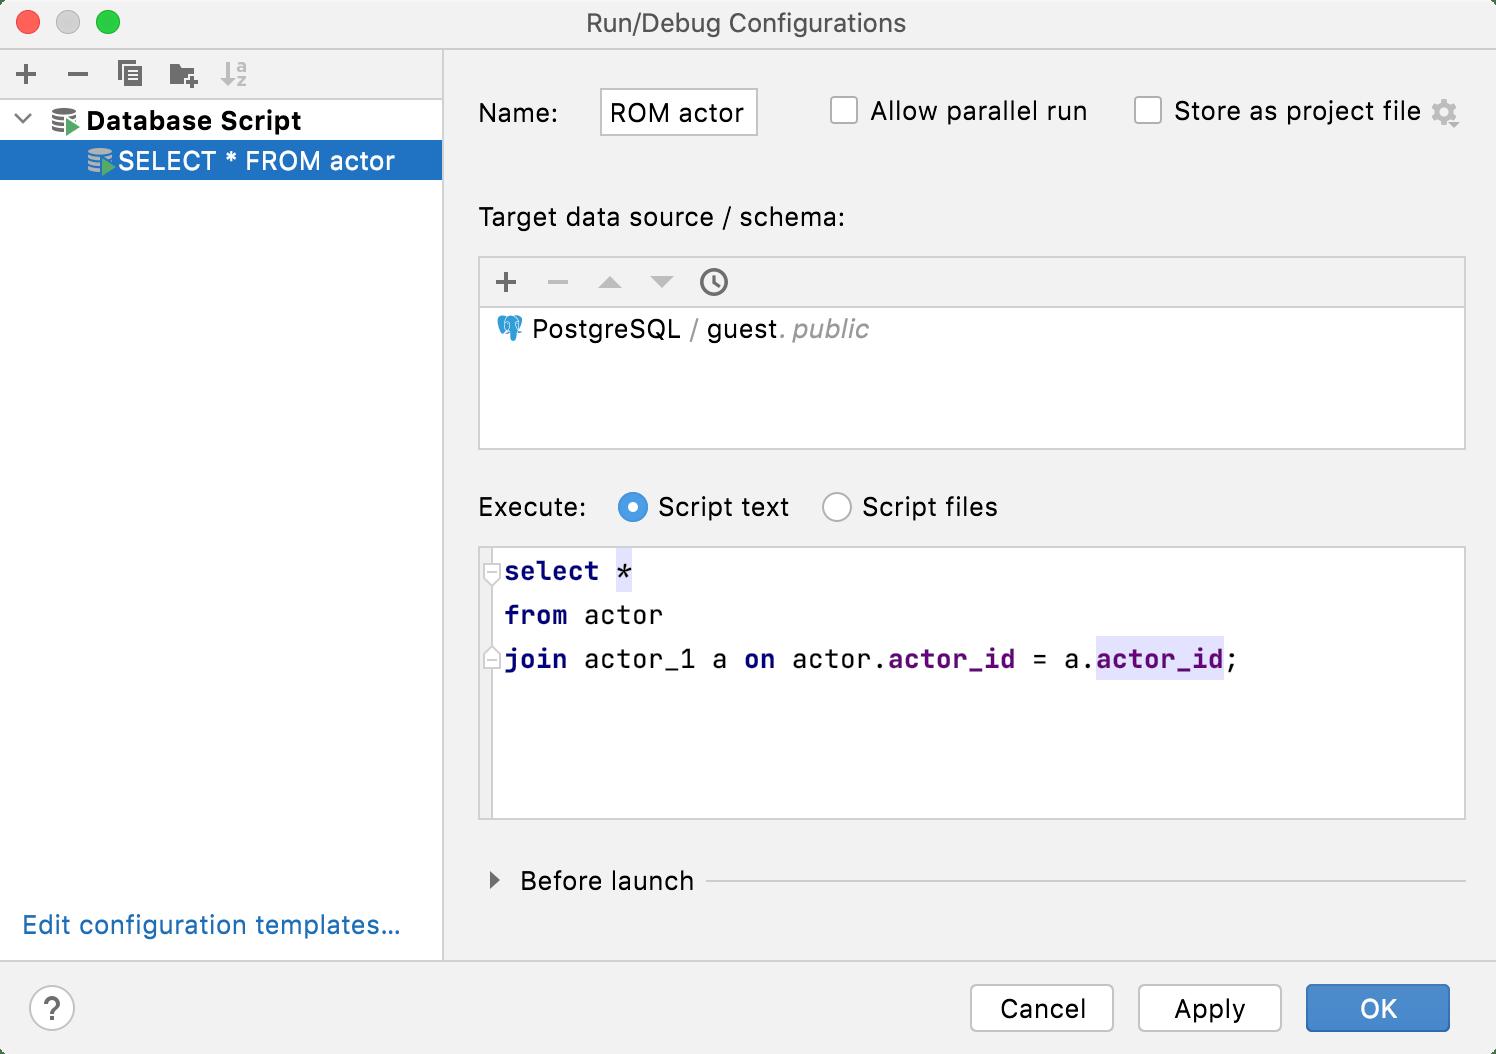 Run/Debug Configuration for database scripts